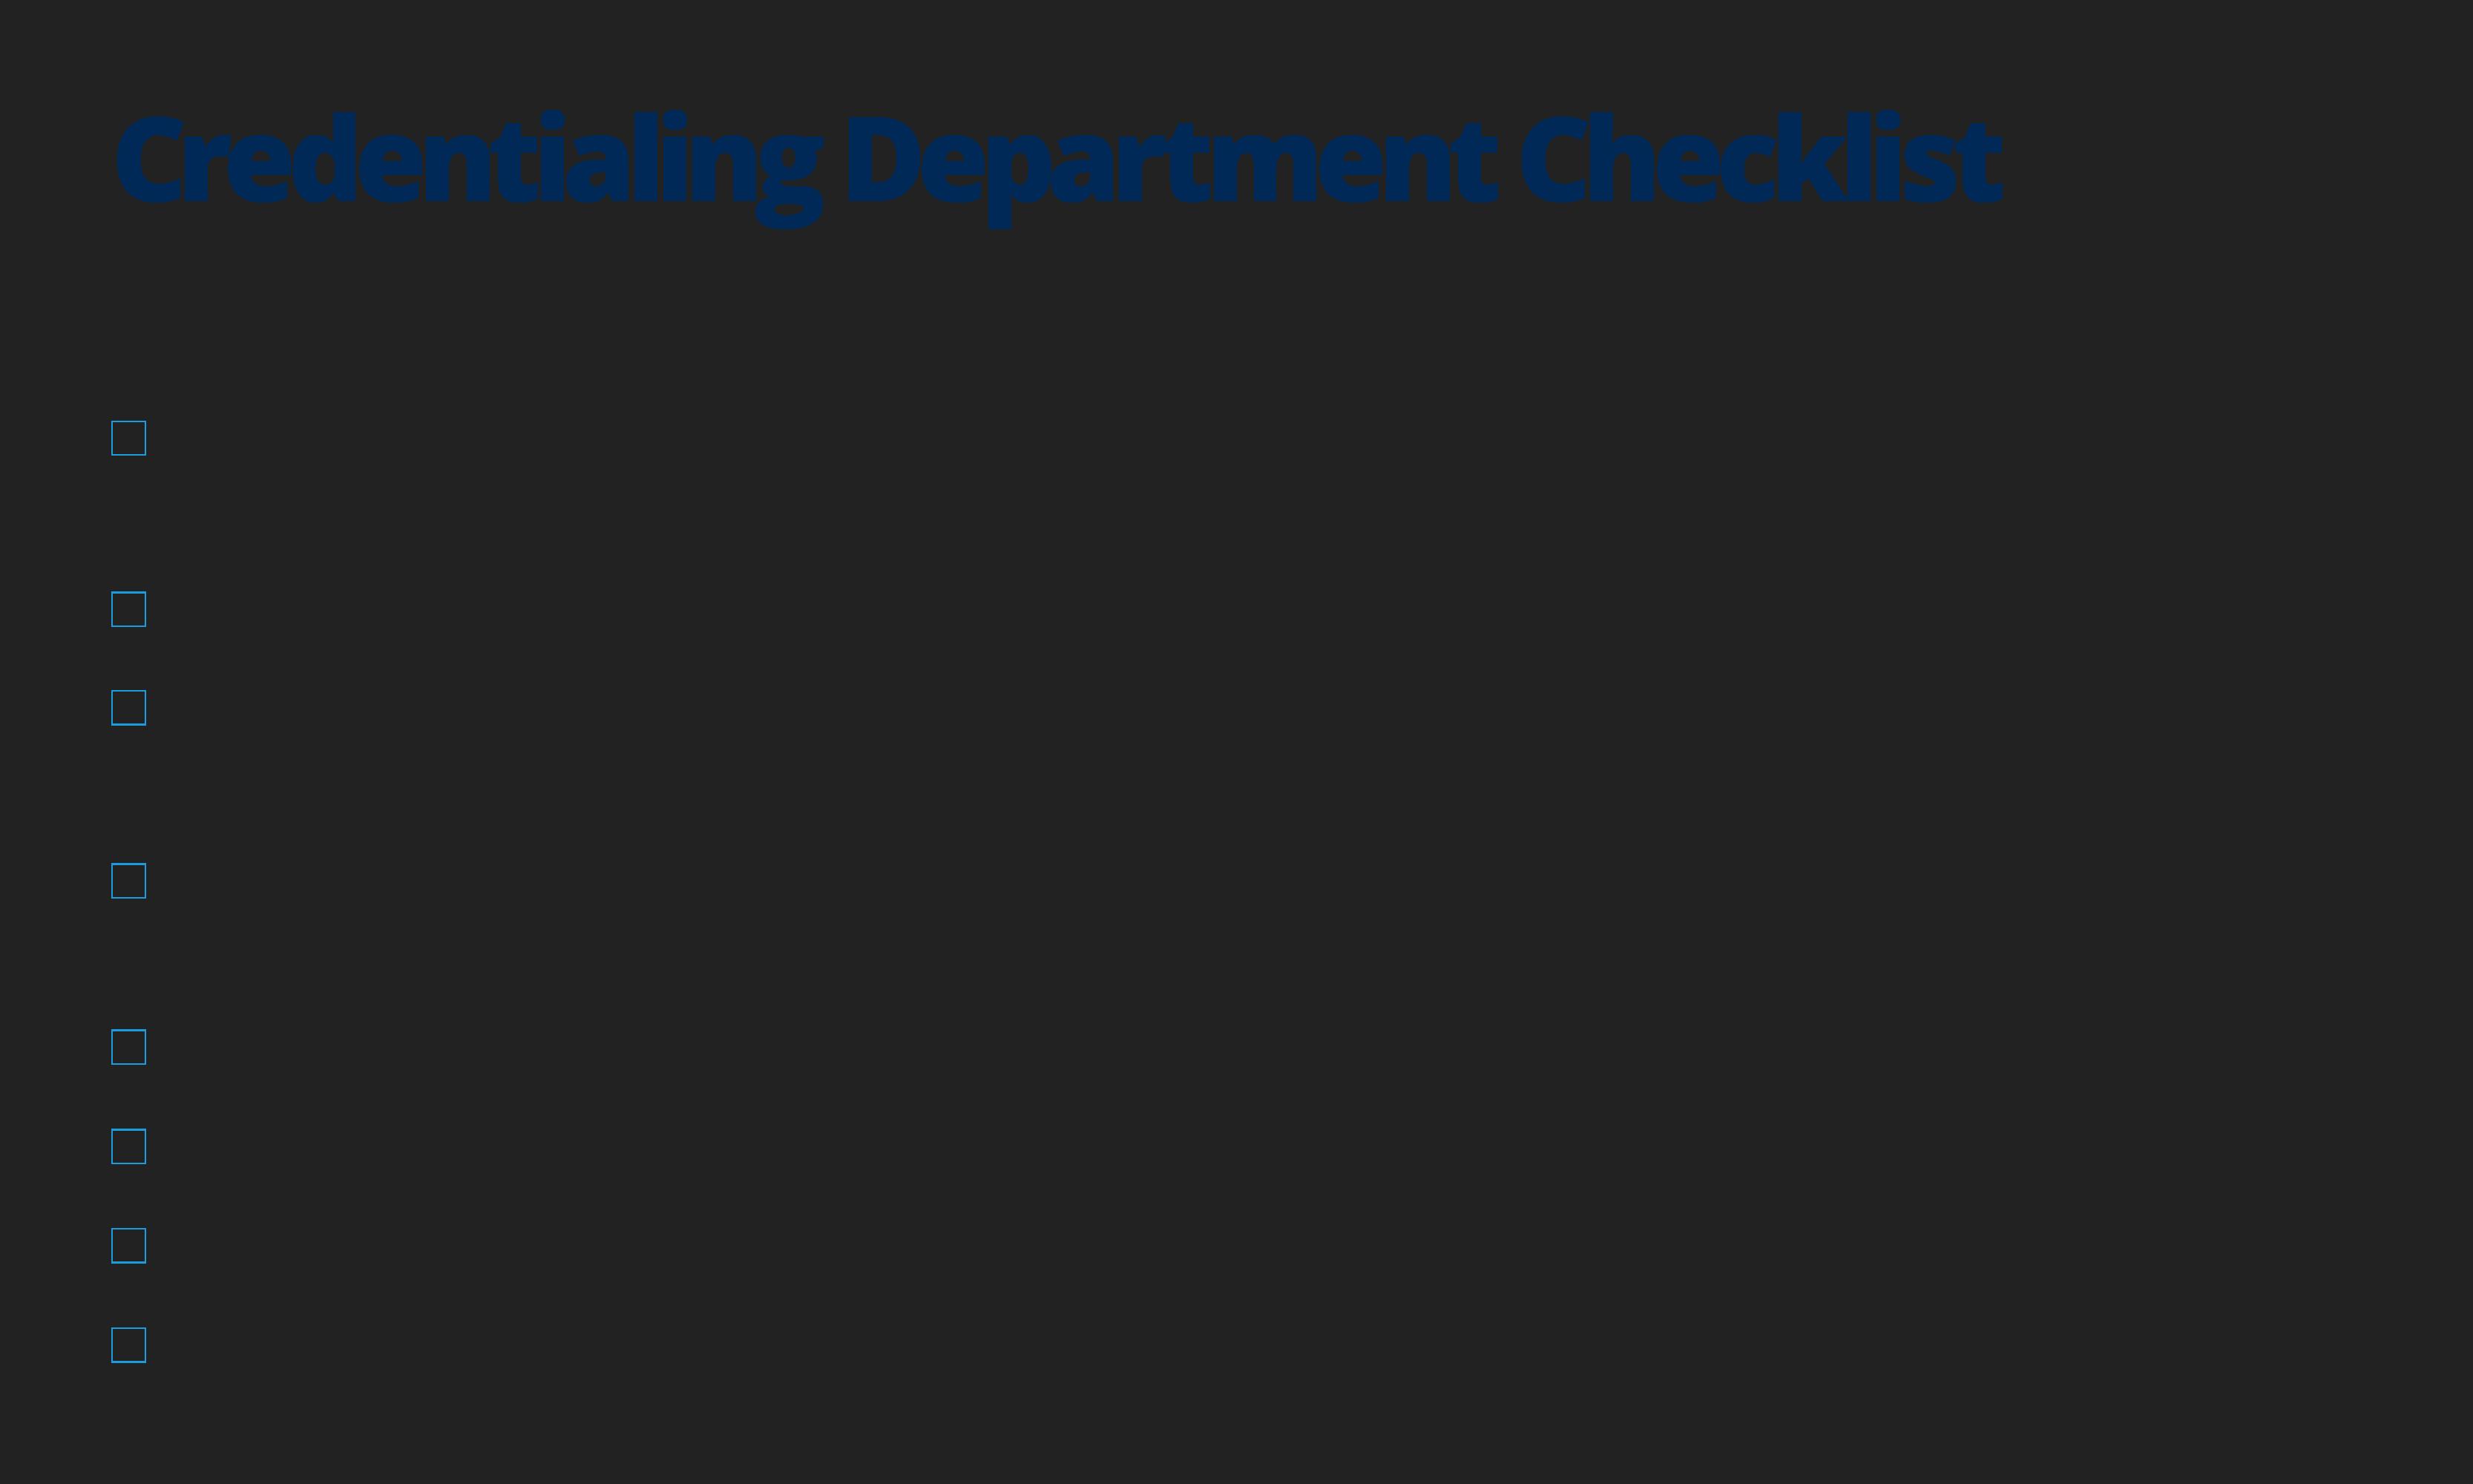 Healthcare Provider Credentialing Application Checklist